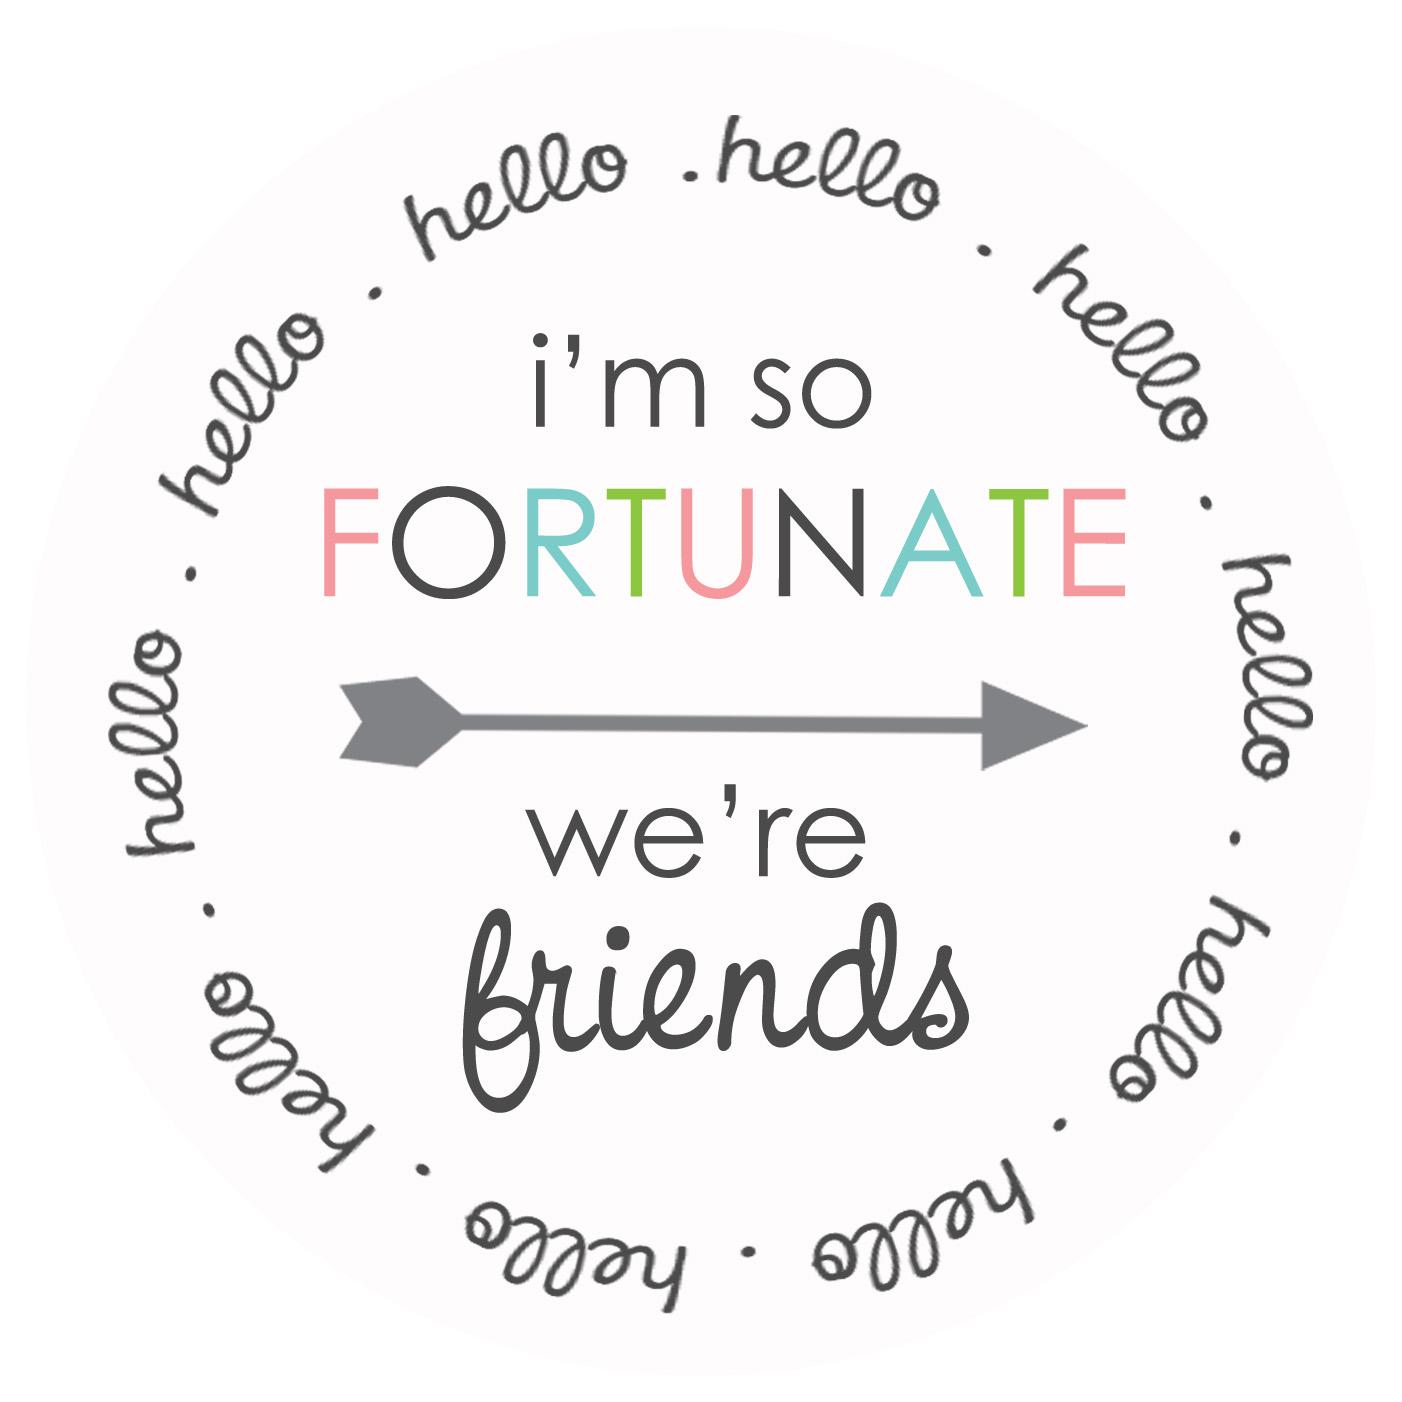 printable fortune cookie sayings pdf